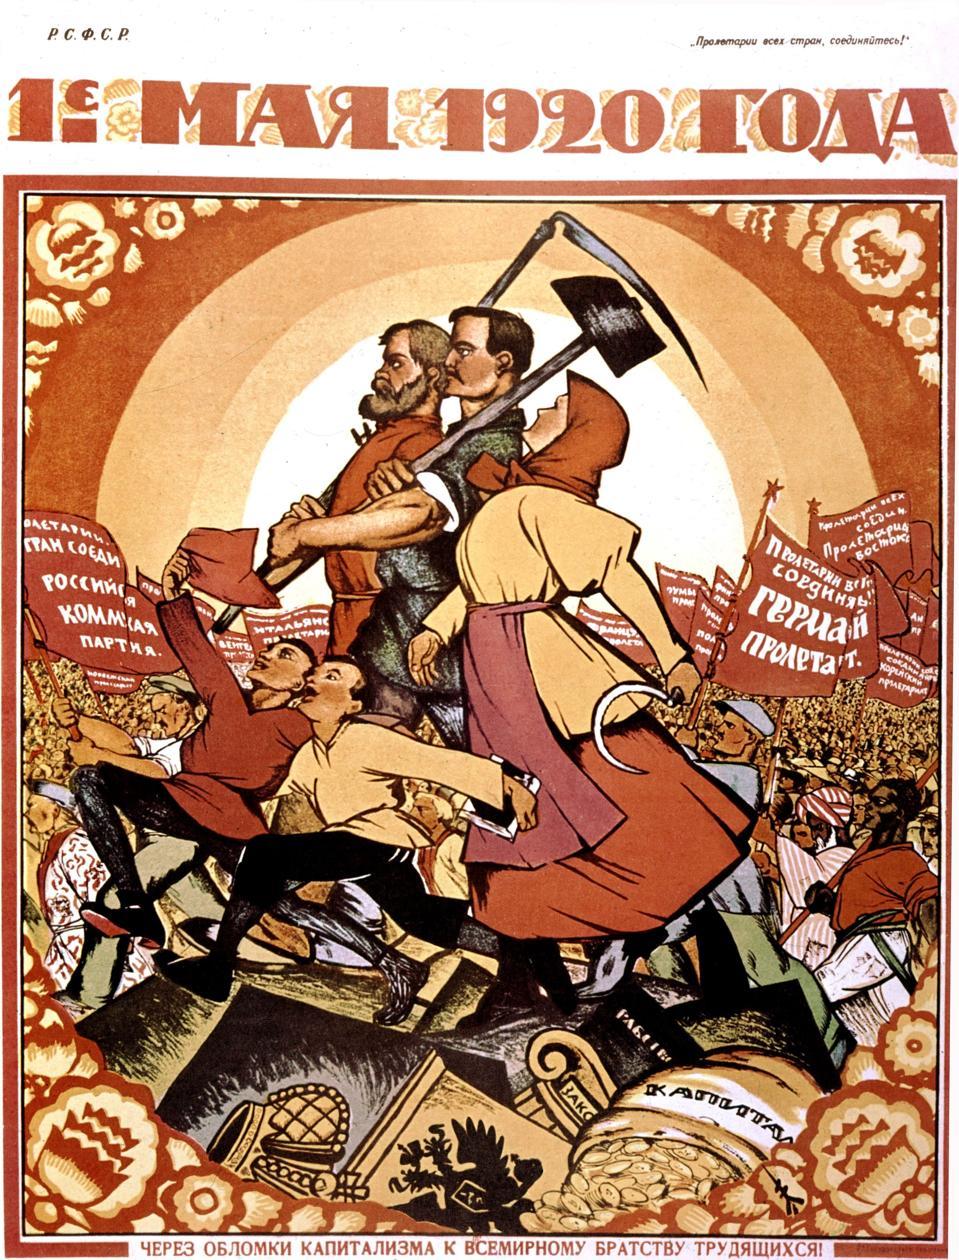 Soviet propaganda poster by Nicolai Kotcherguin